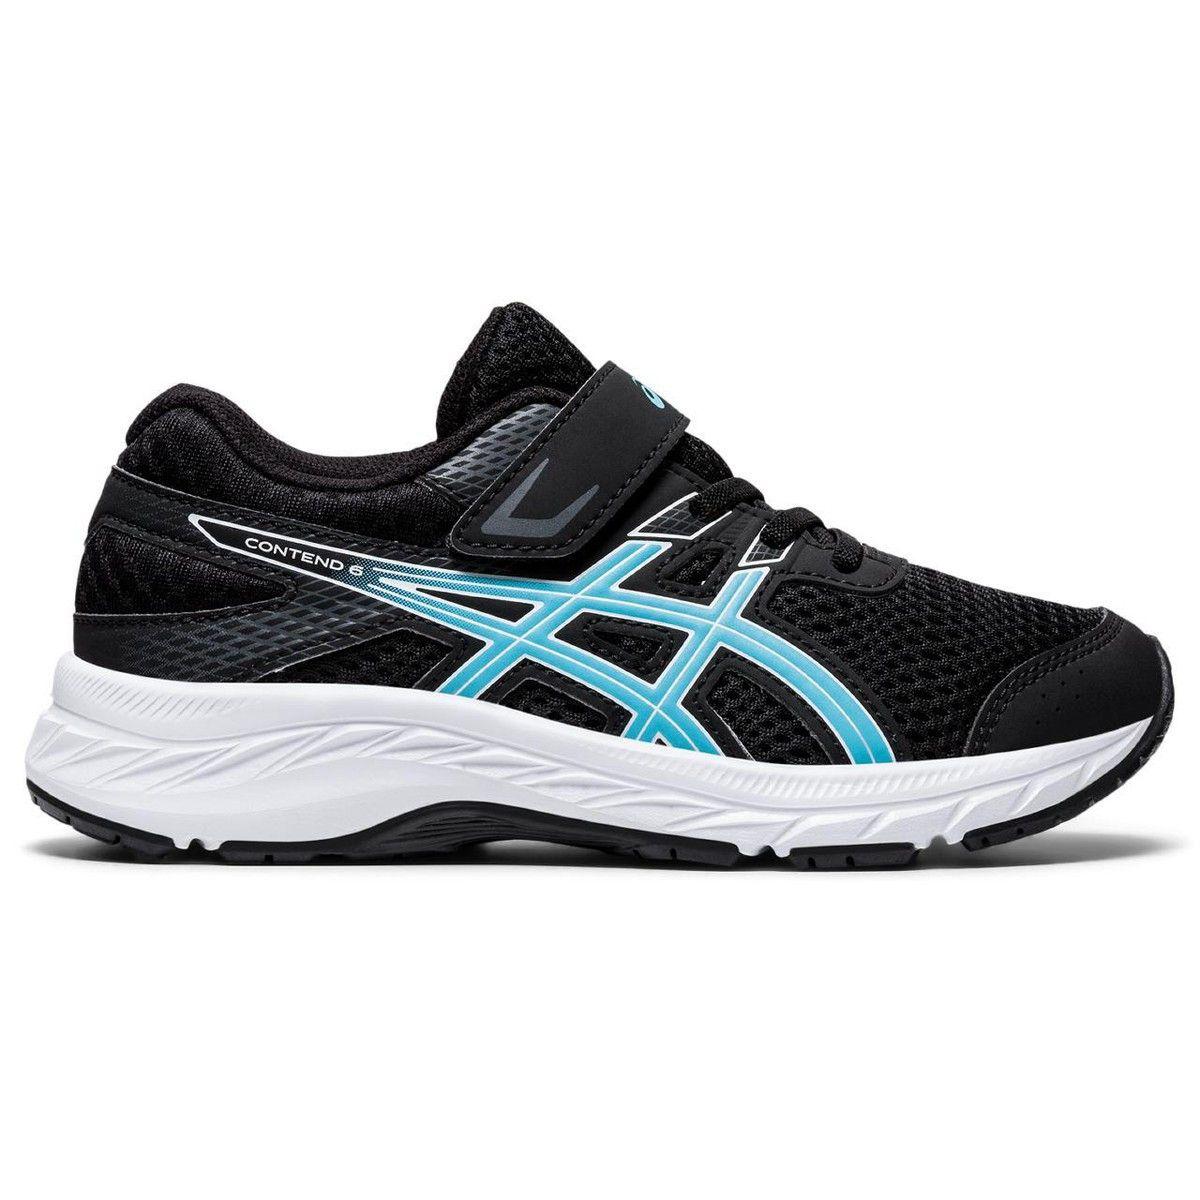 Asics Gel Contend 6 Junior Running Shoes (PS)